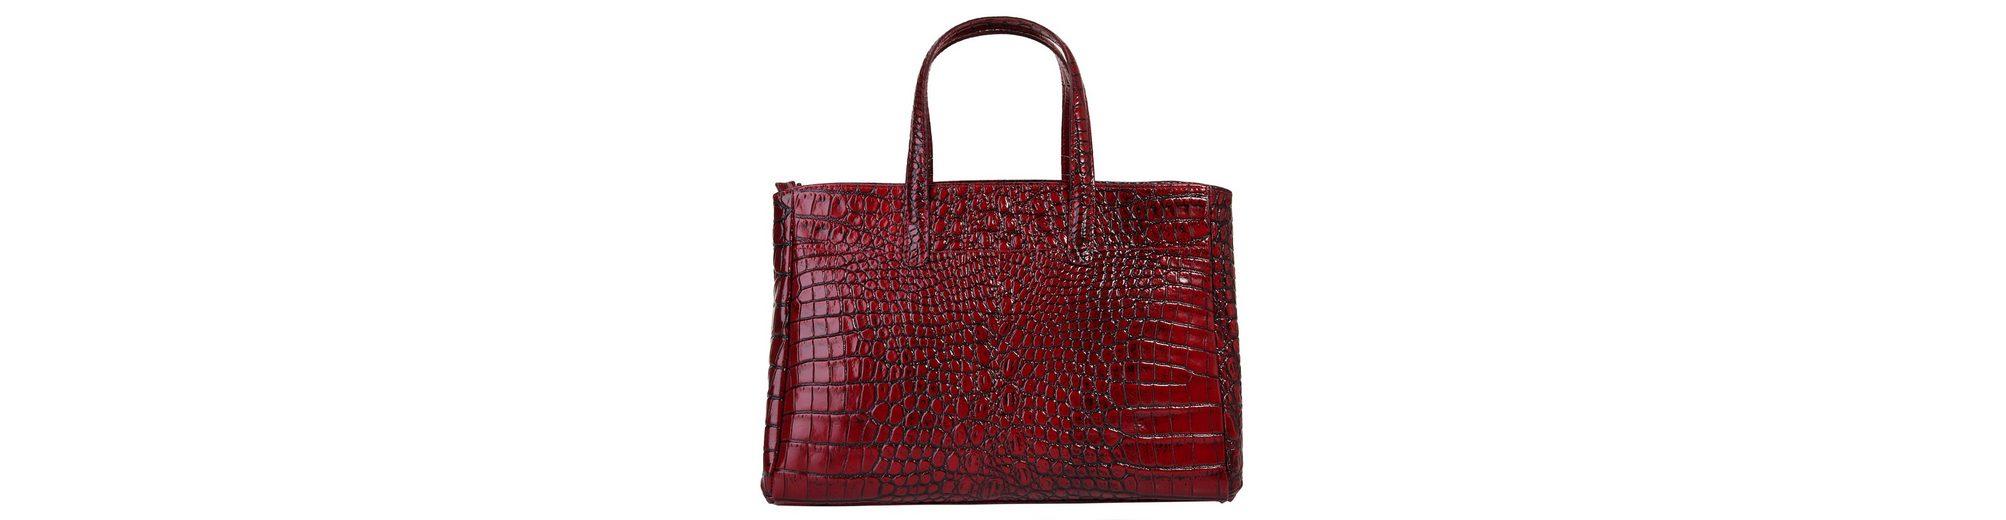 Cluty Handtasche Auslass Verkauf Z0rEMw